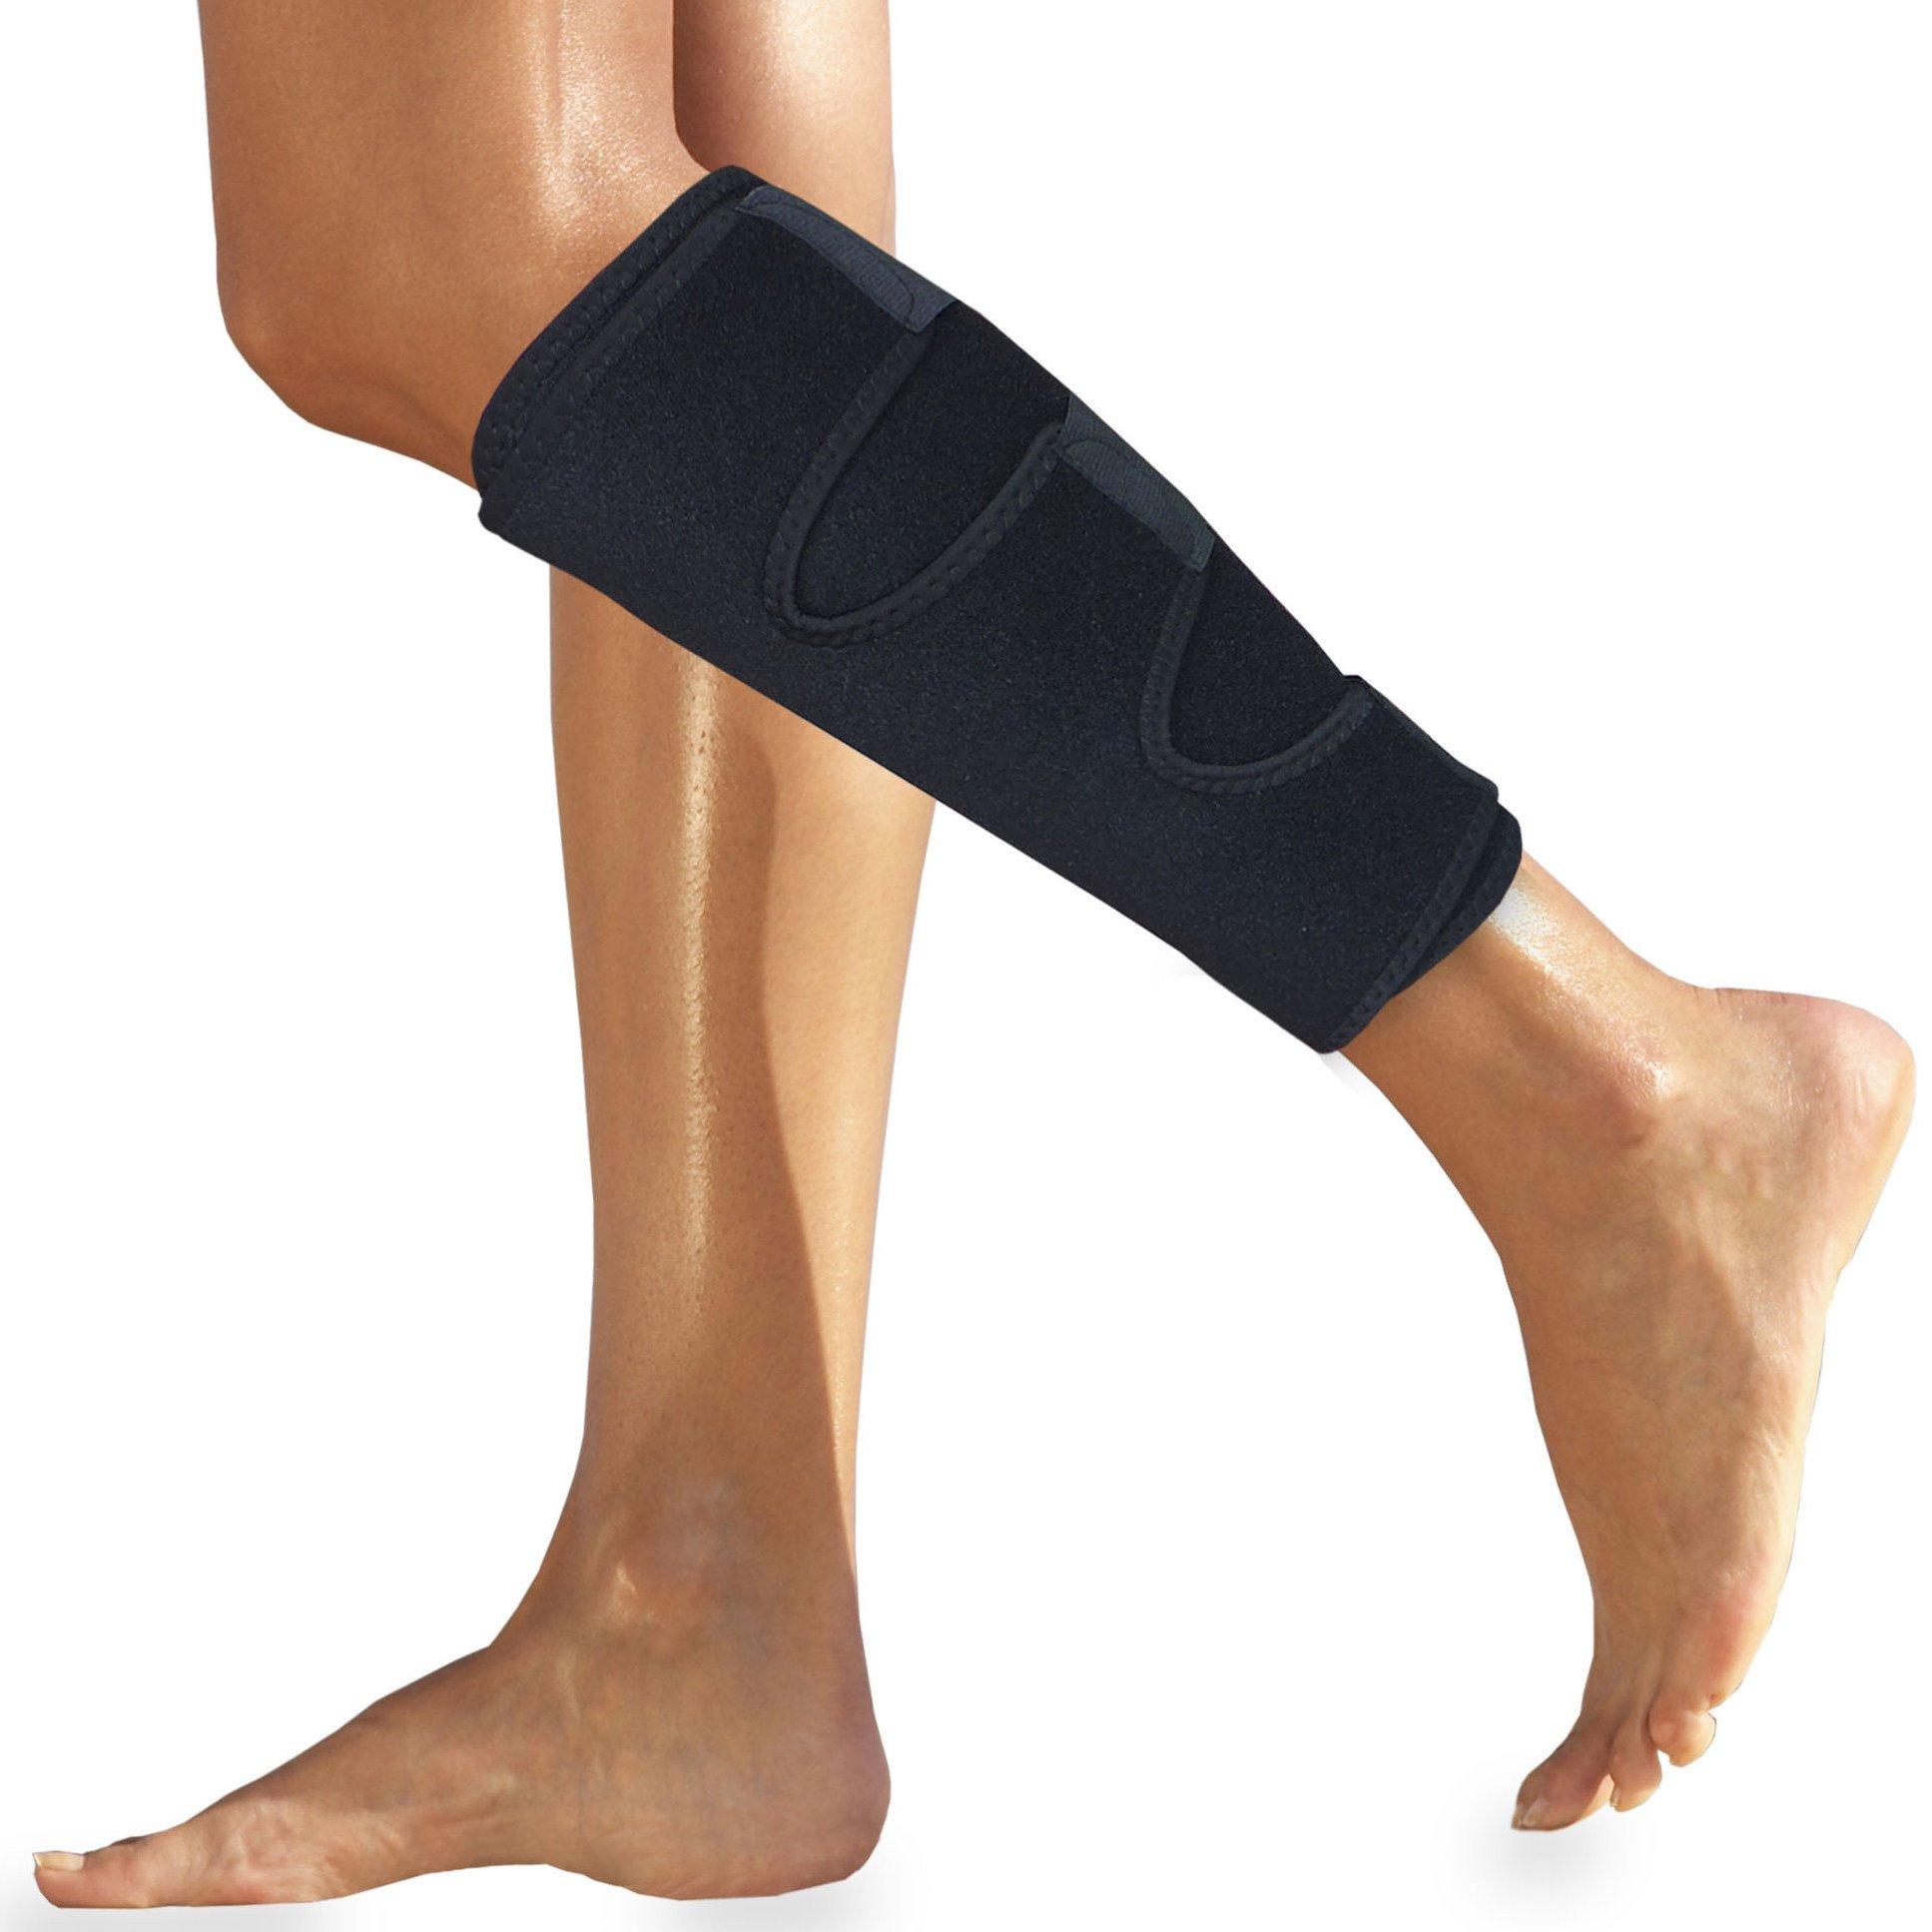 Roxofit Shin Brace - Calf Brace - Shin Splint Support for Calf Pain Relief Strain Sprain Tennis Leg Injury Best Calf Compression Sleeve - Lower Leg Brace Men Women